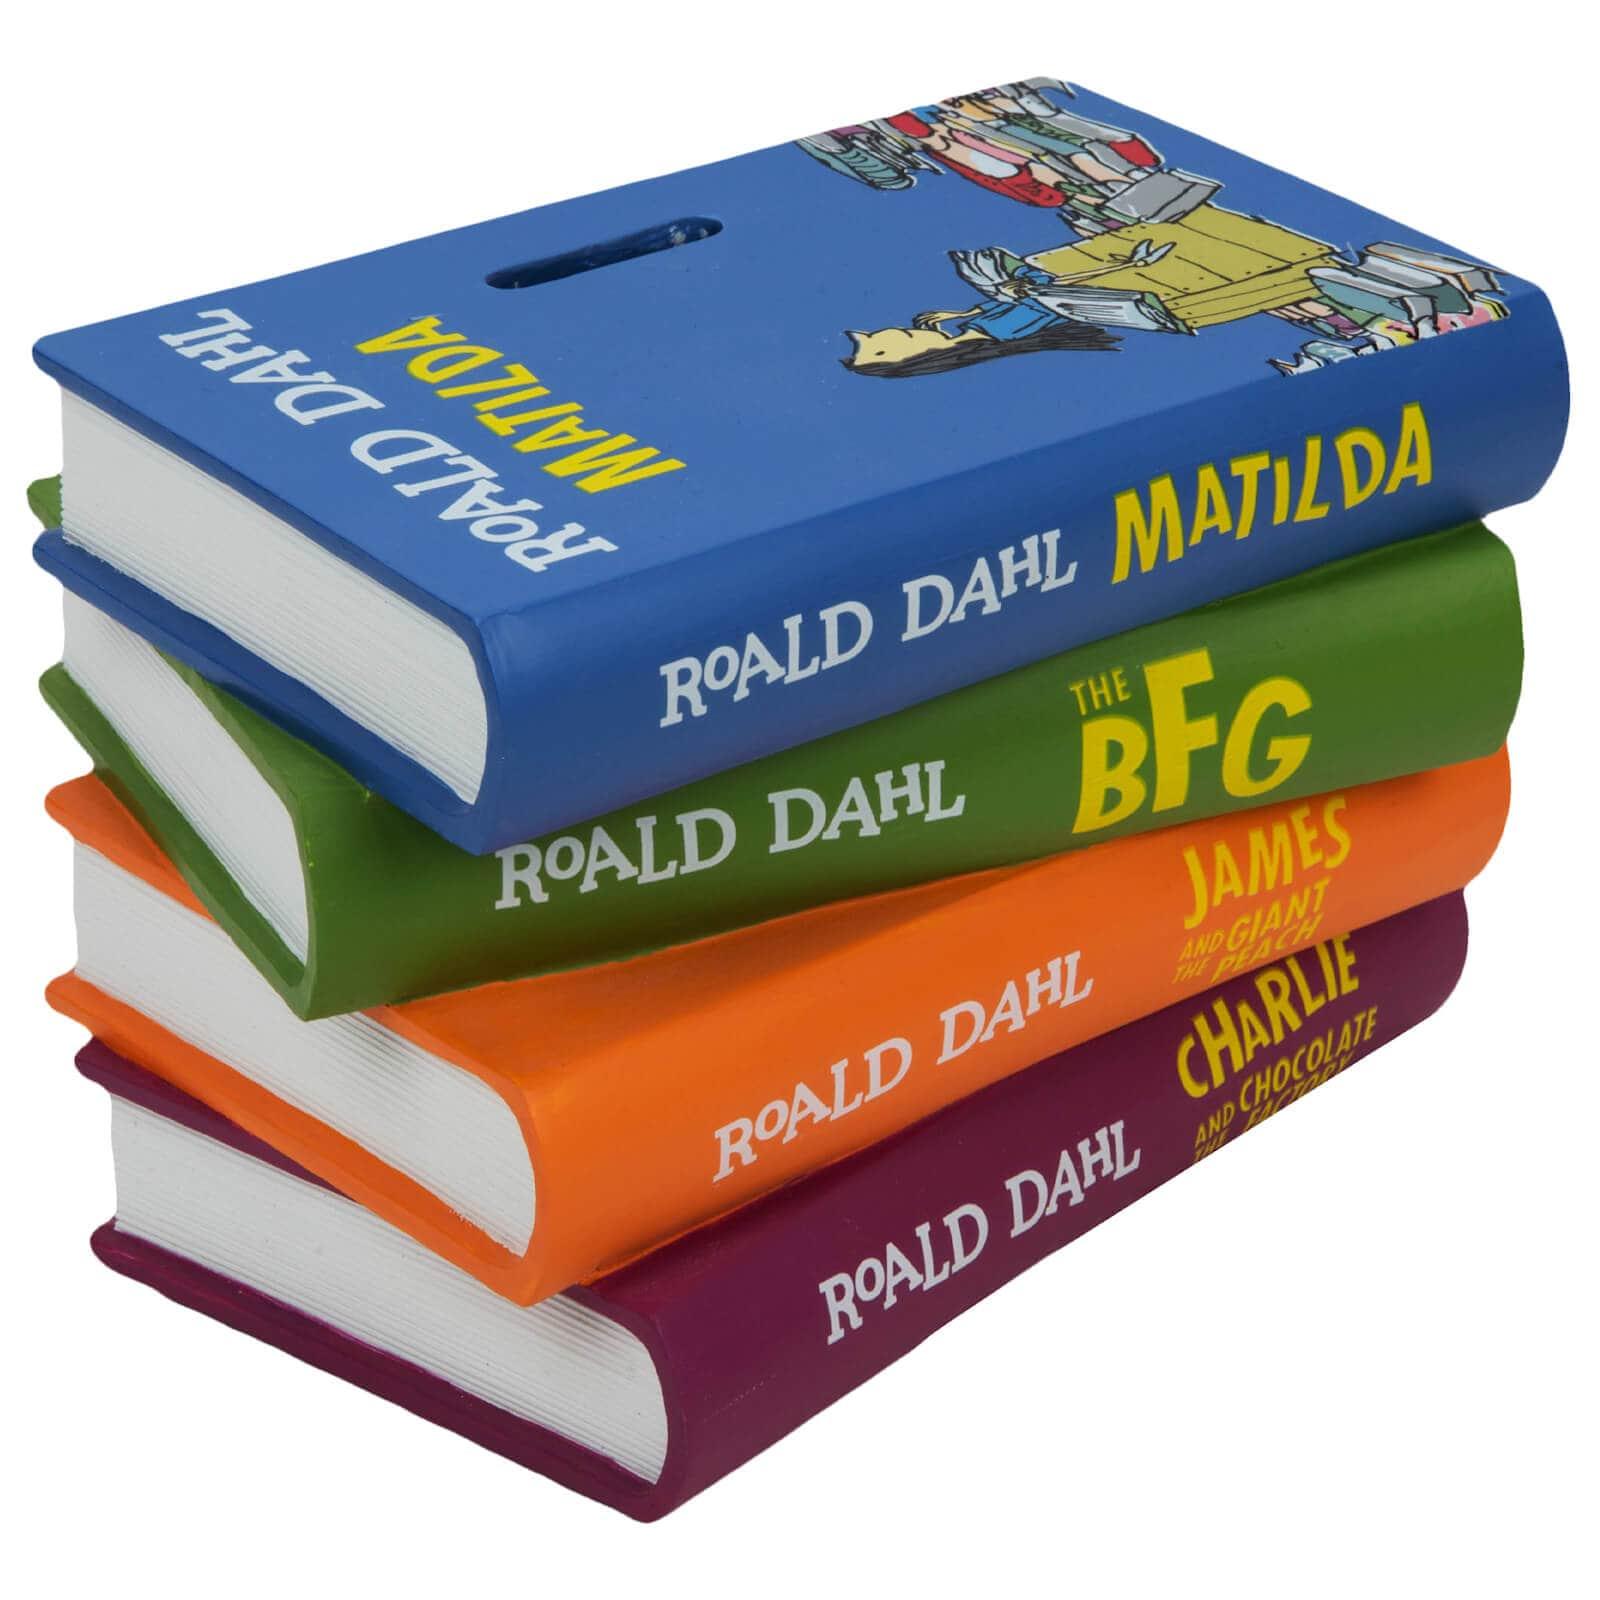 Roald Dahl Pile Of Books Money Box.